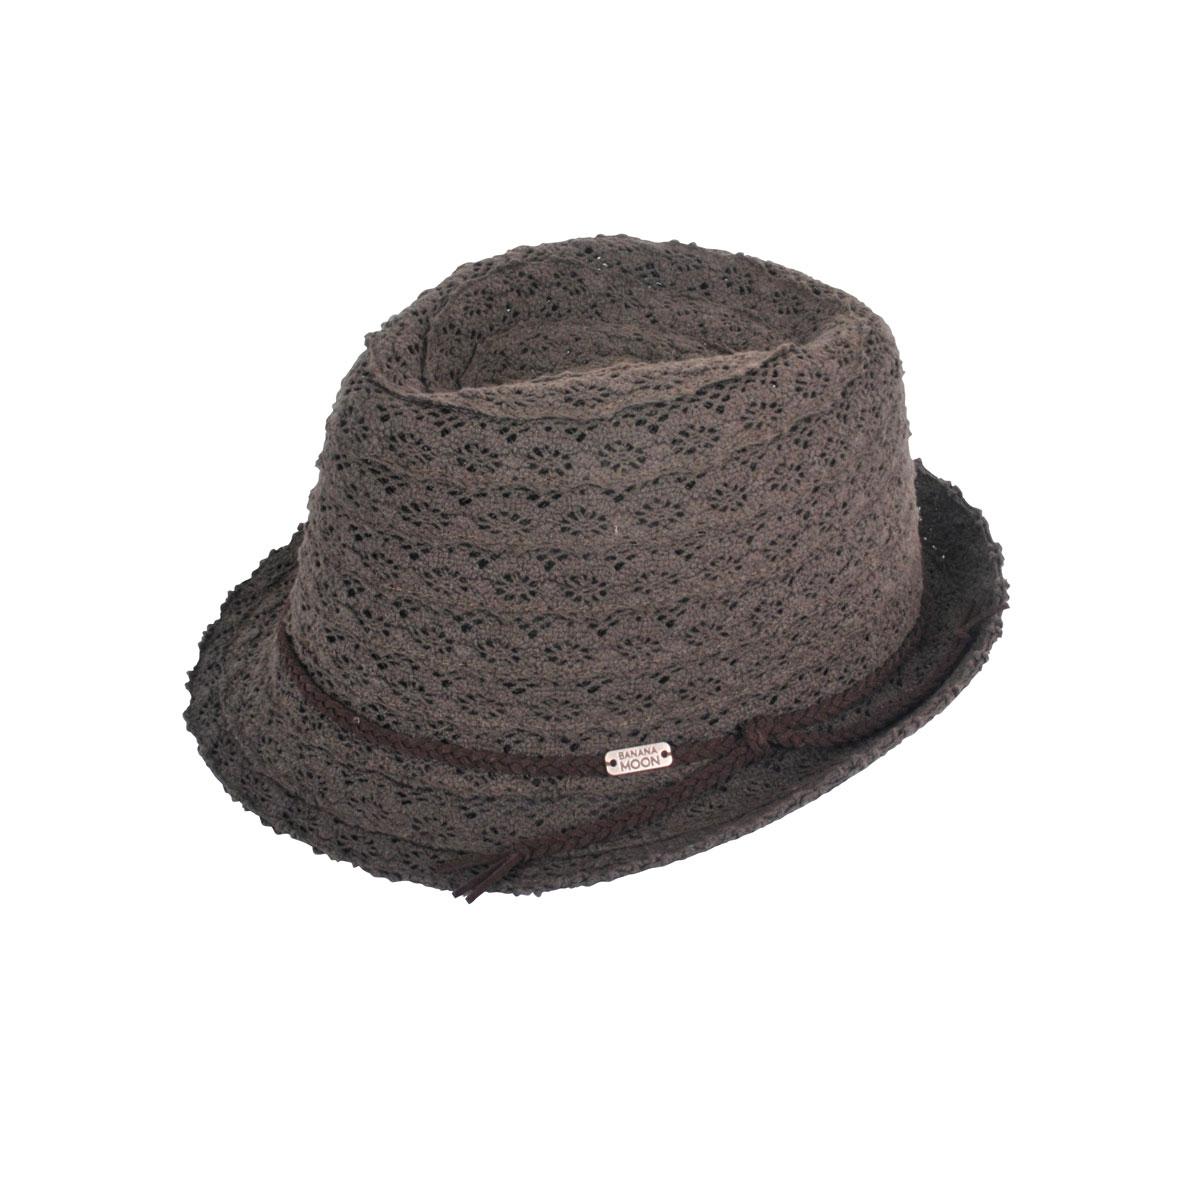 Chapeau de plage brodé vert kaki Hatsy